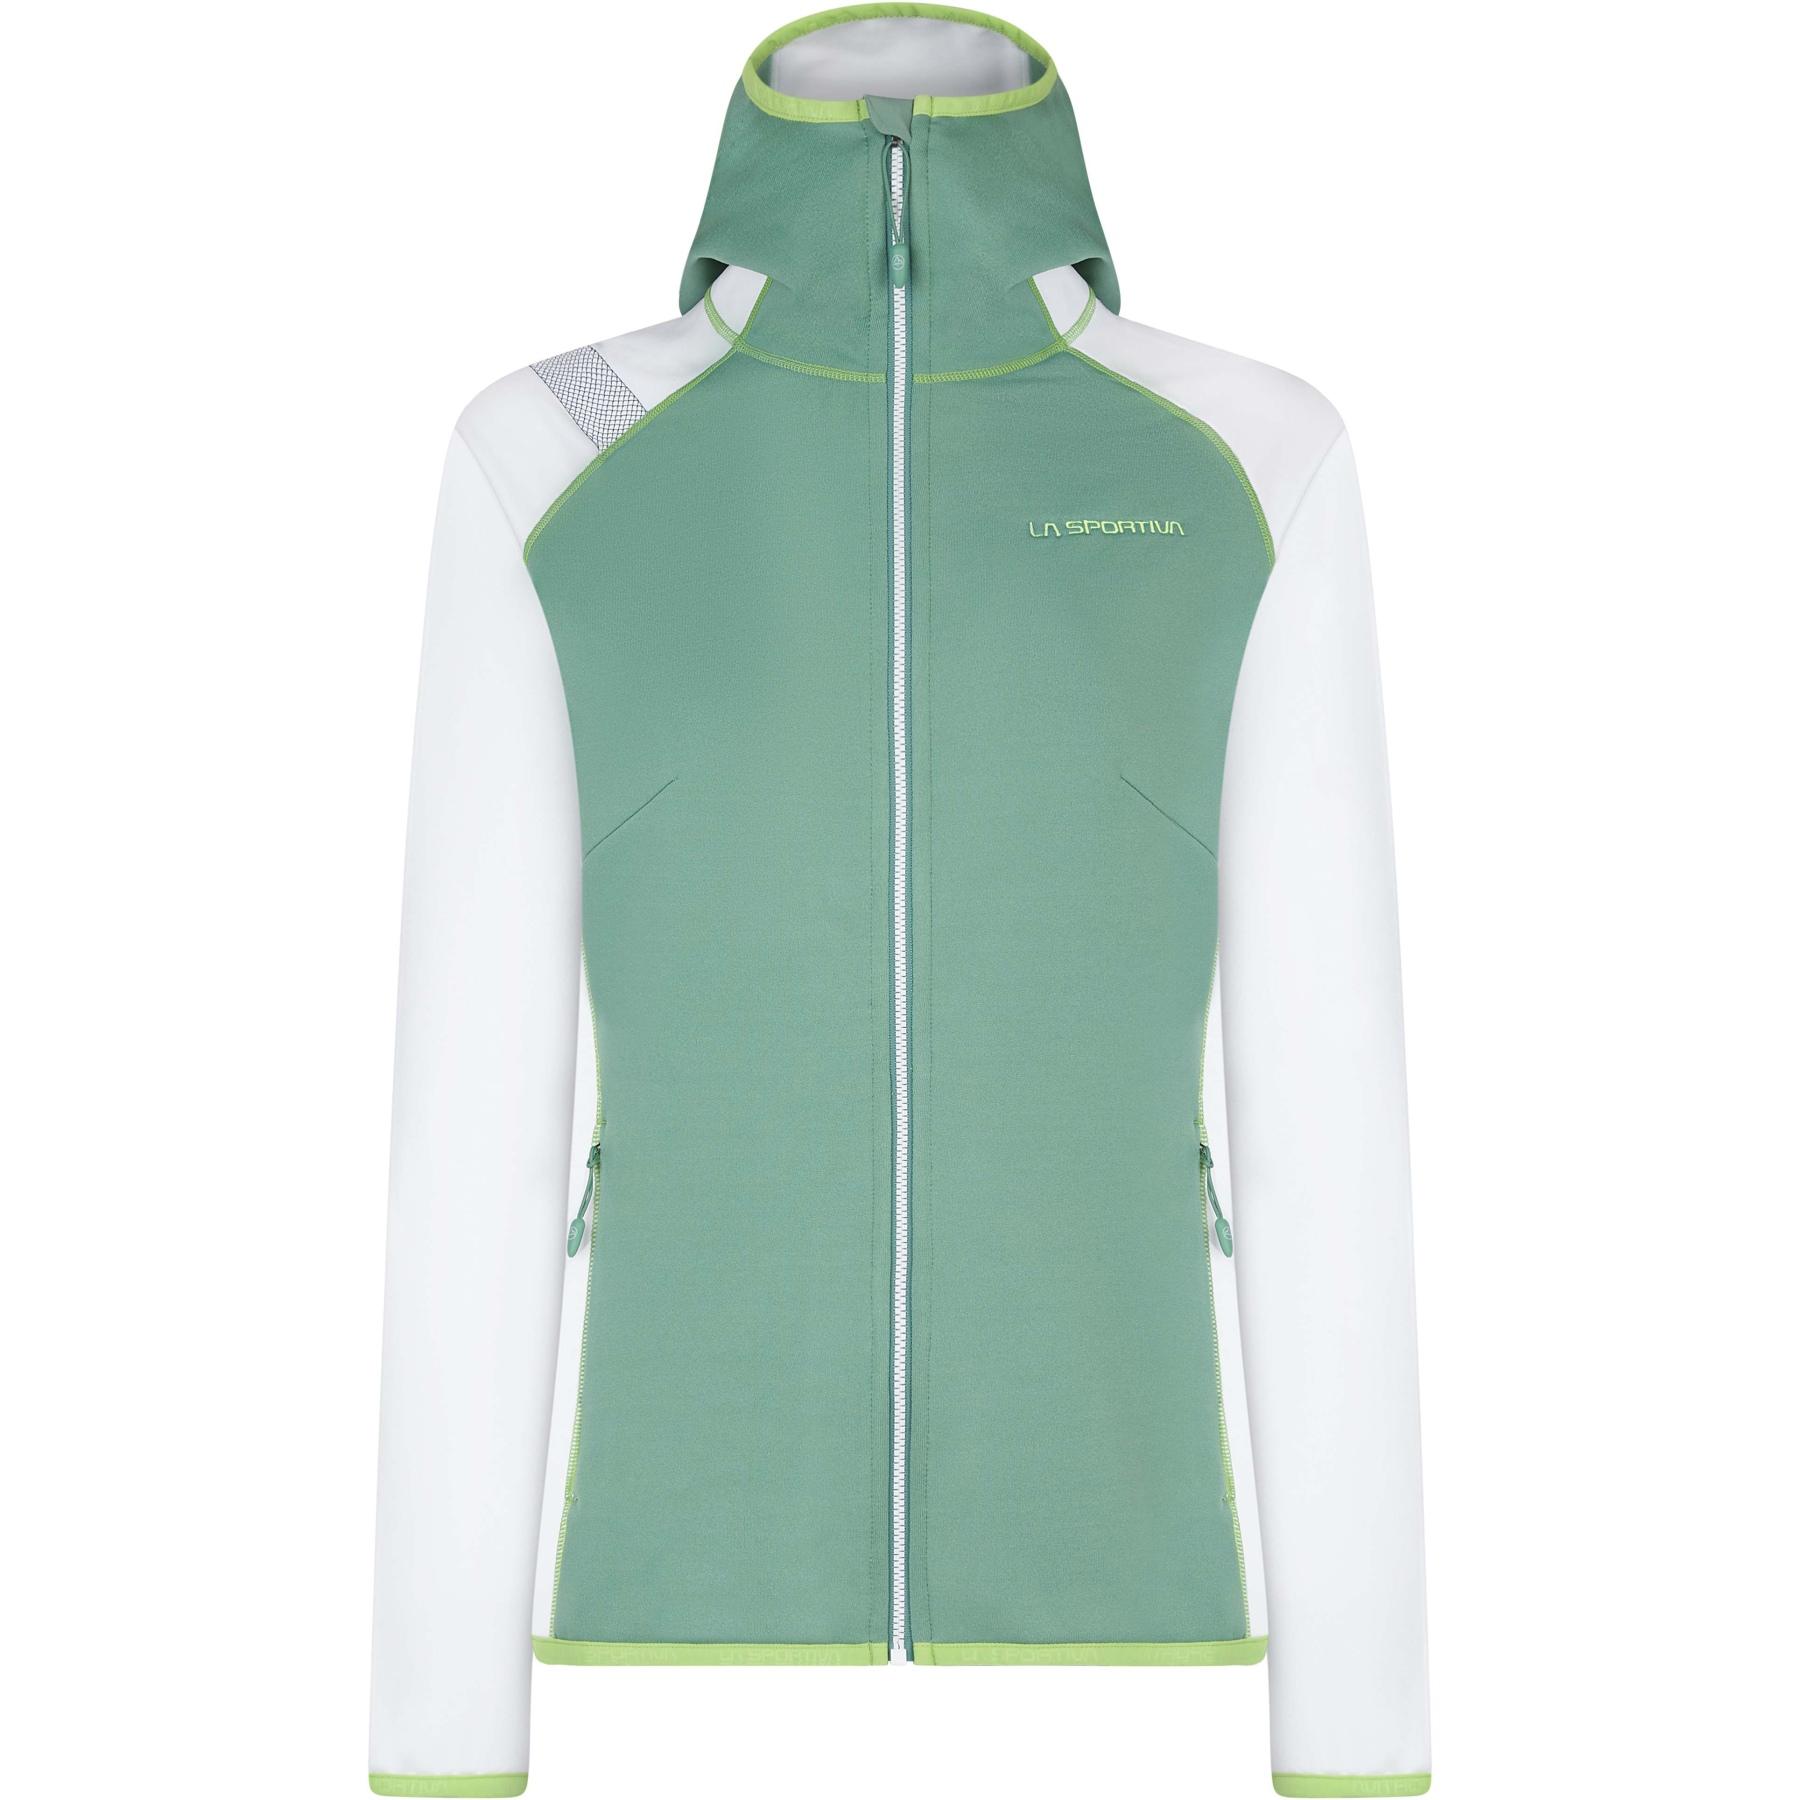 La Sportiva Alaris Hoody Jacket Women - Grass Green/White